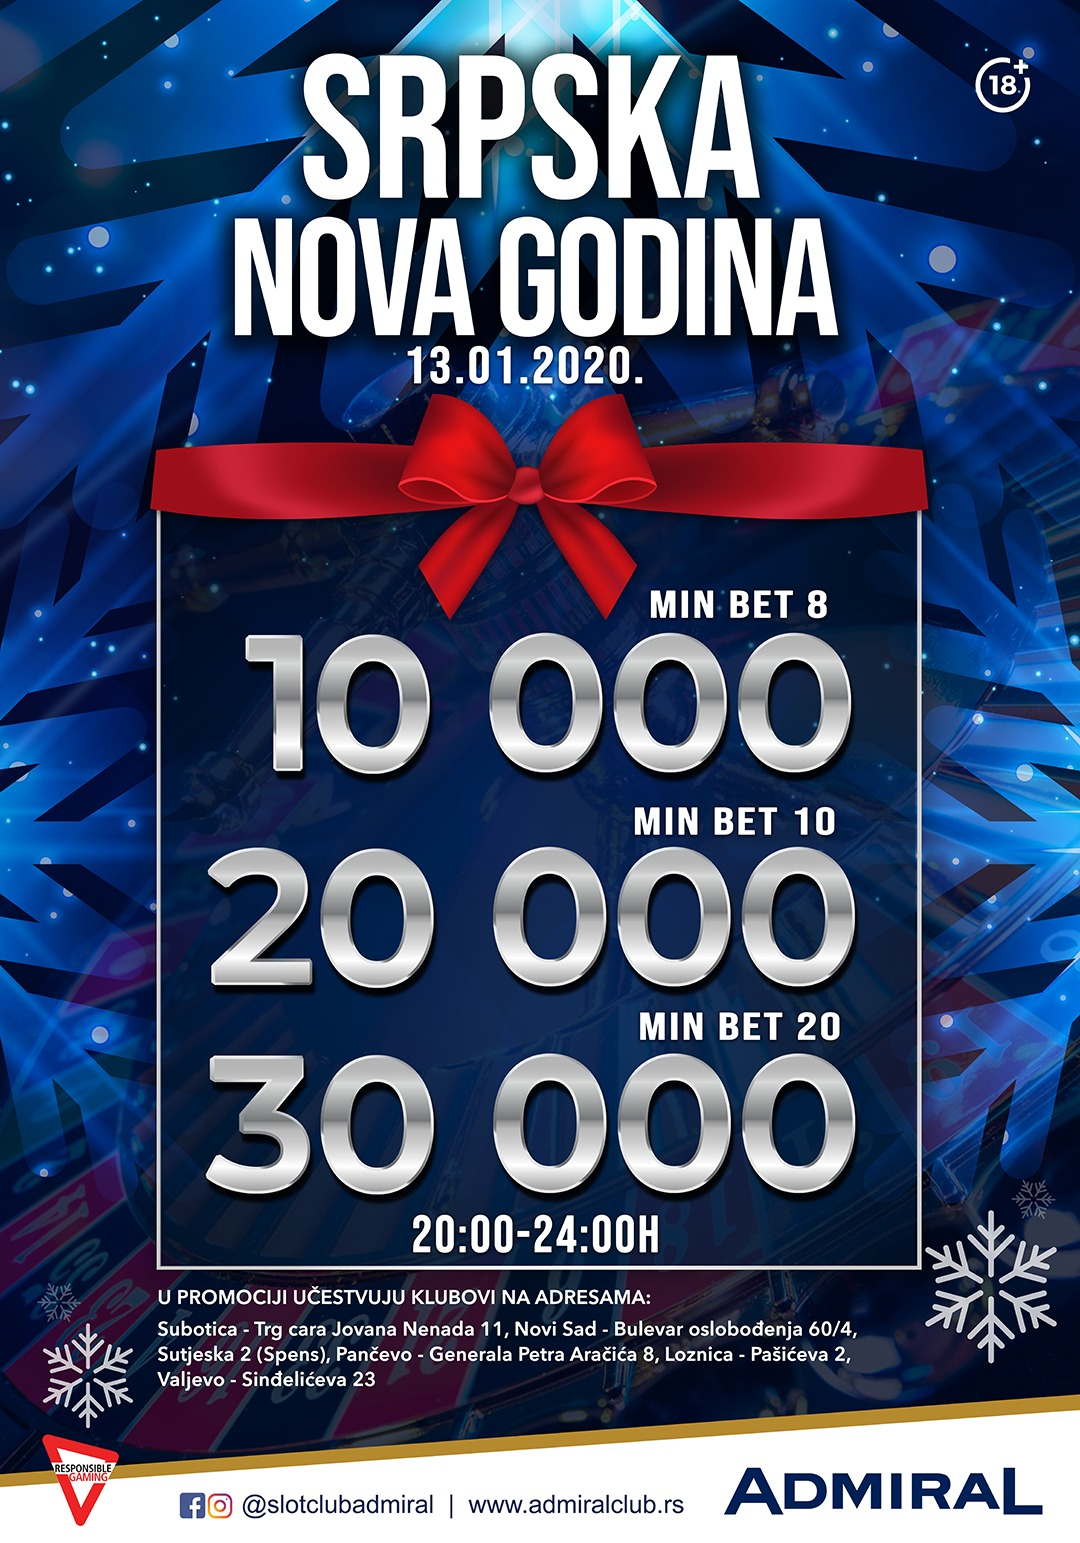 Srpska nova godina 3 – ns spens